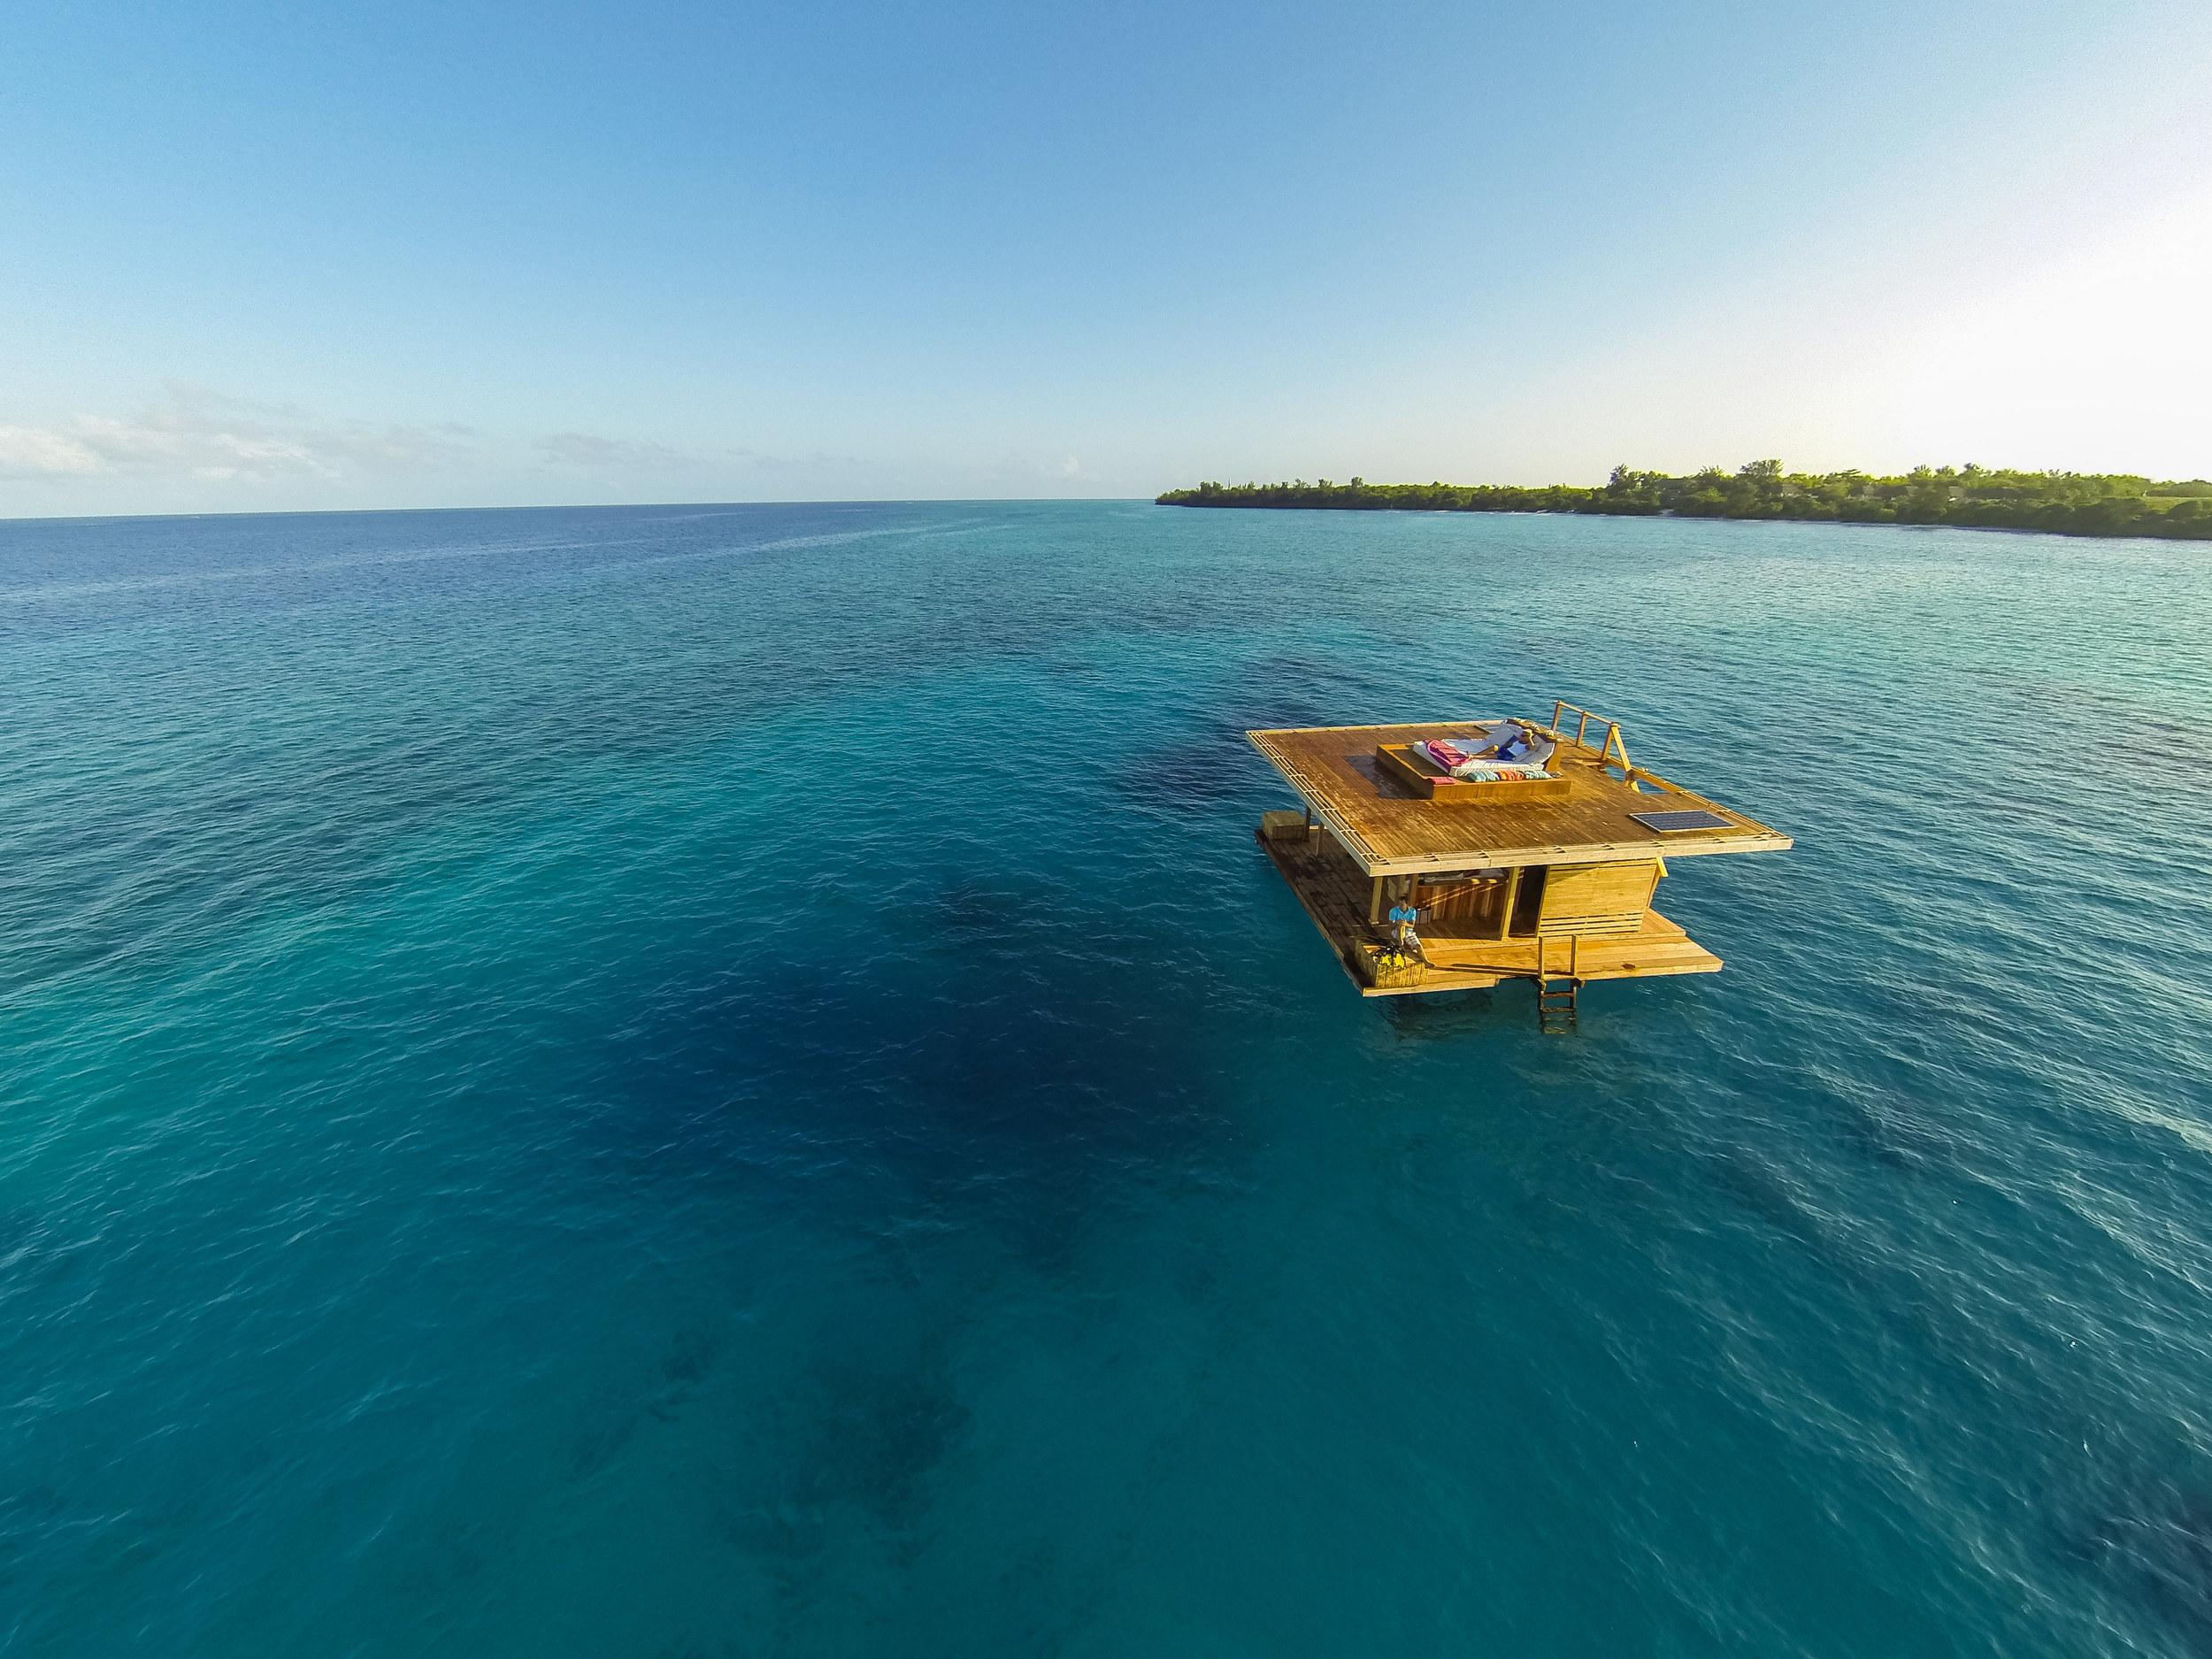 Image property of Manta Resort